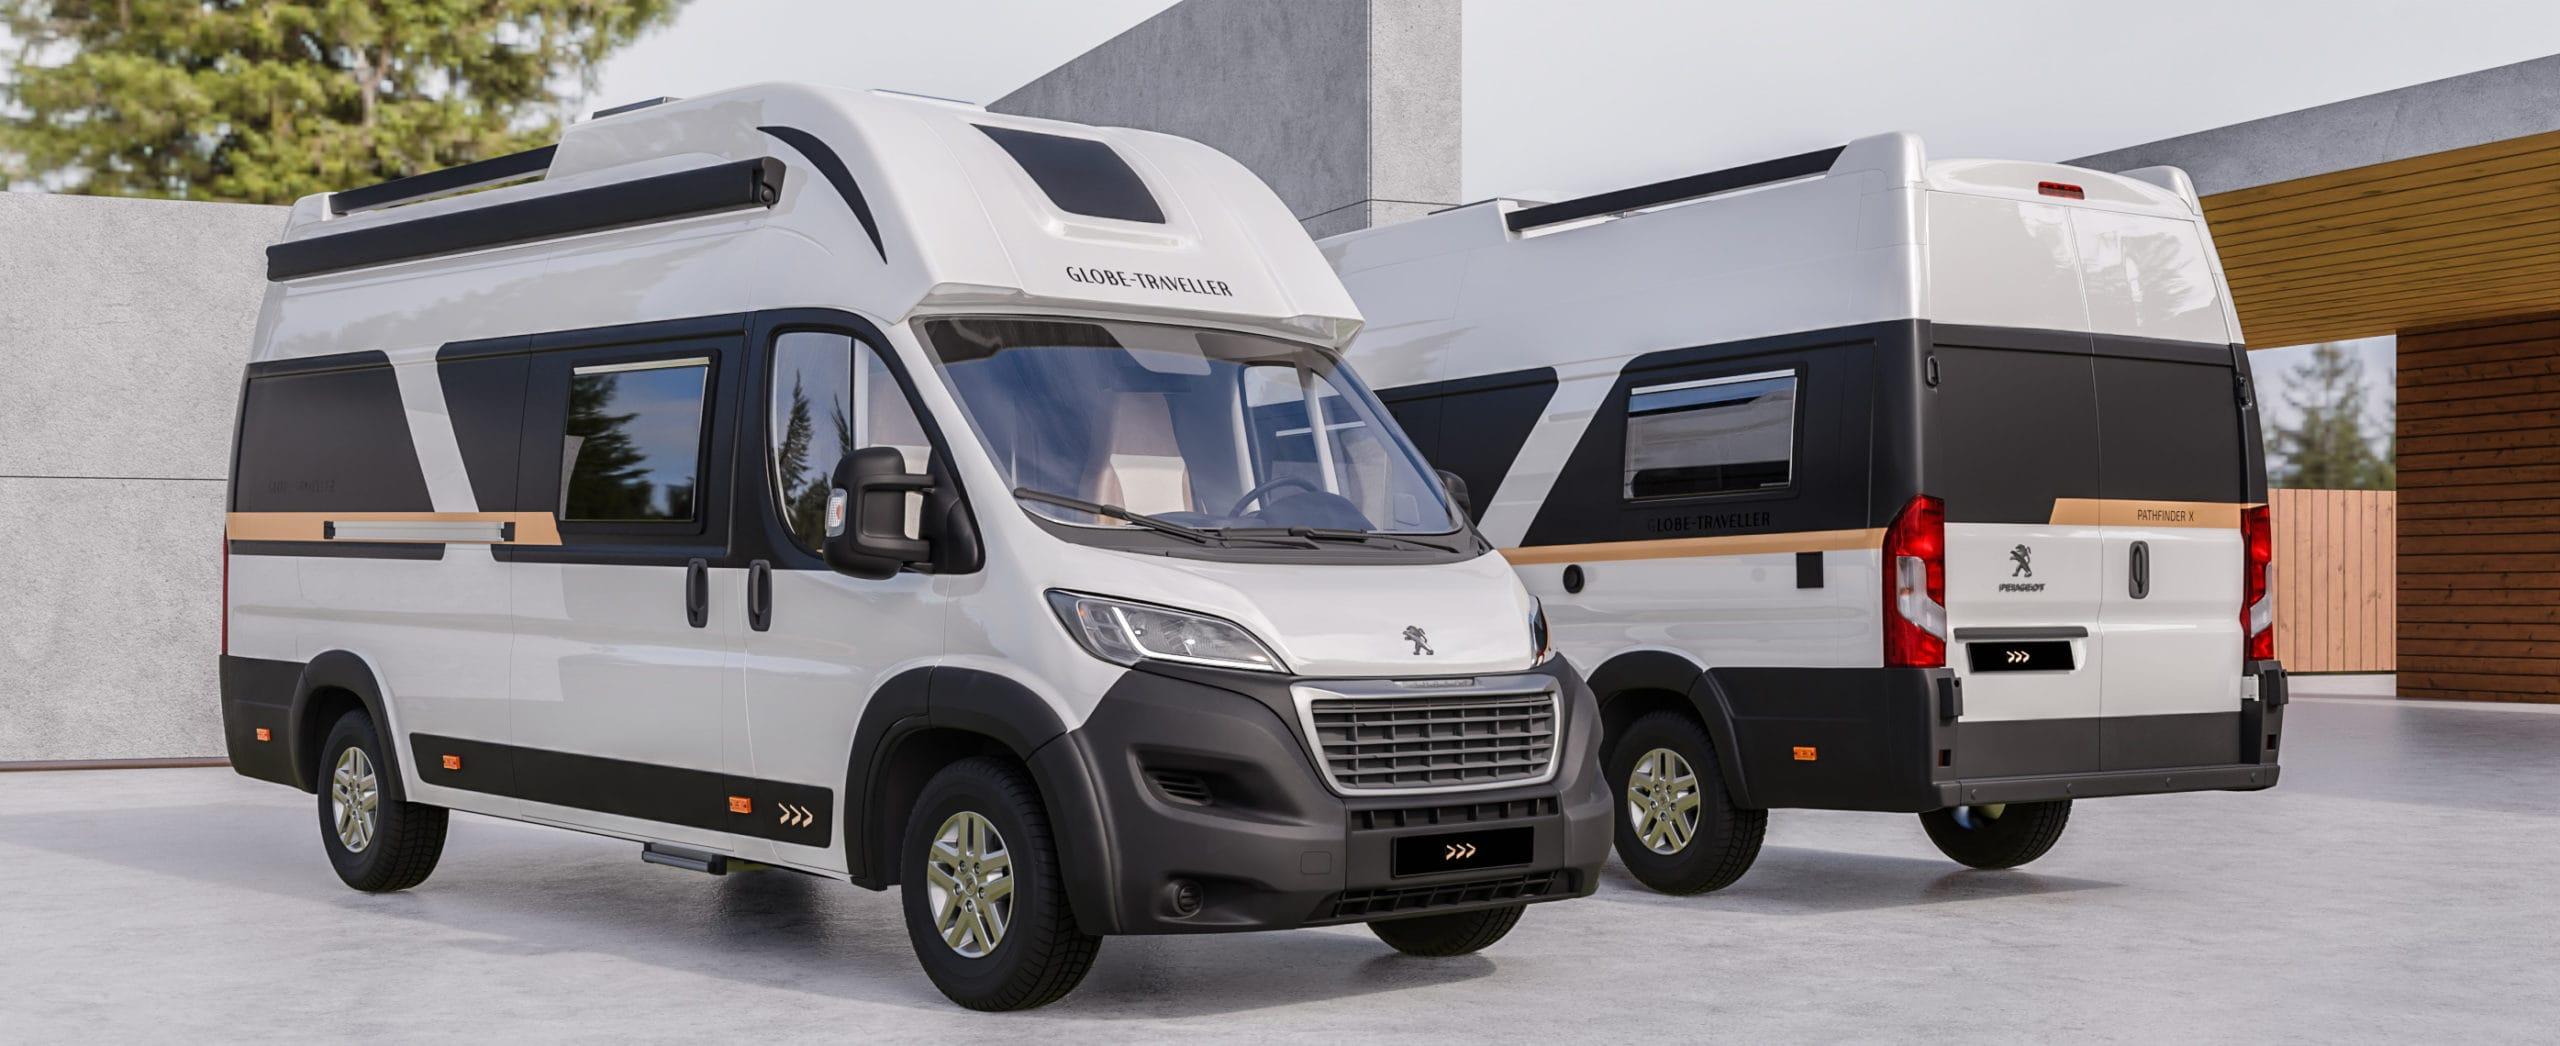 Globe-Traveller Pathfinder Series